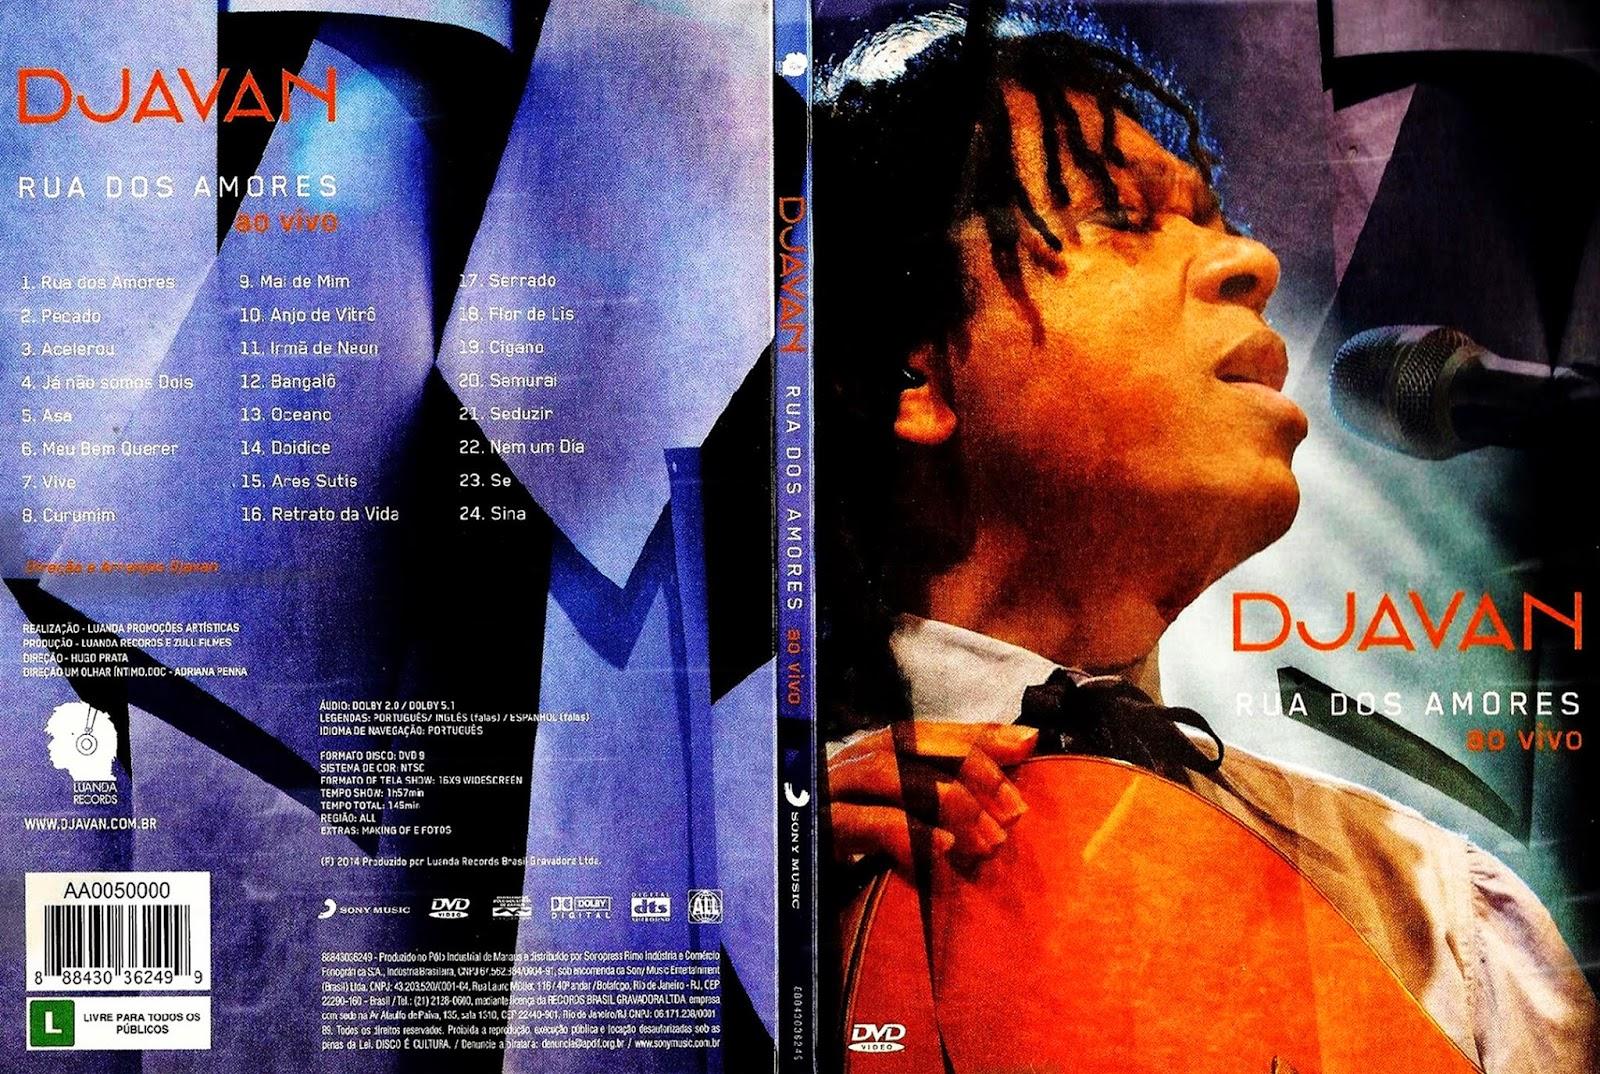 dvd do djavan ao vivo